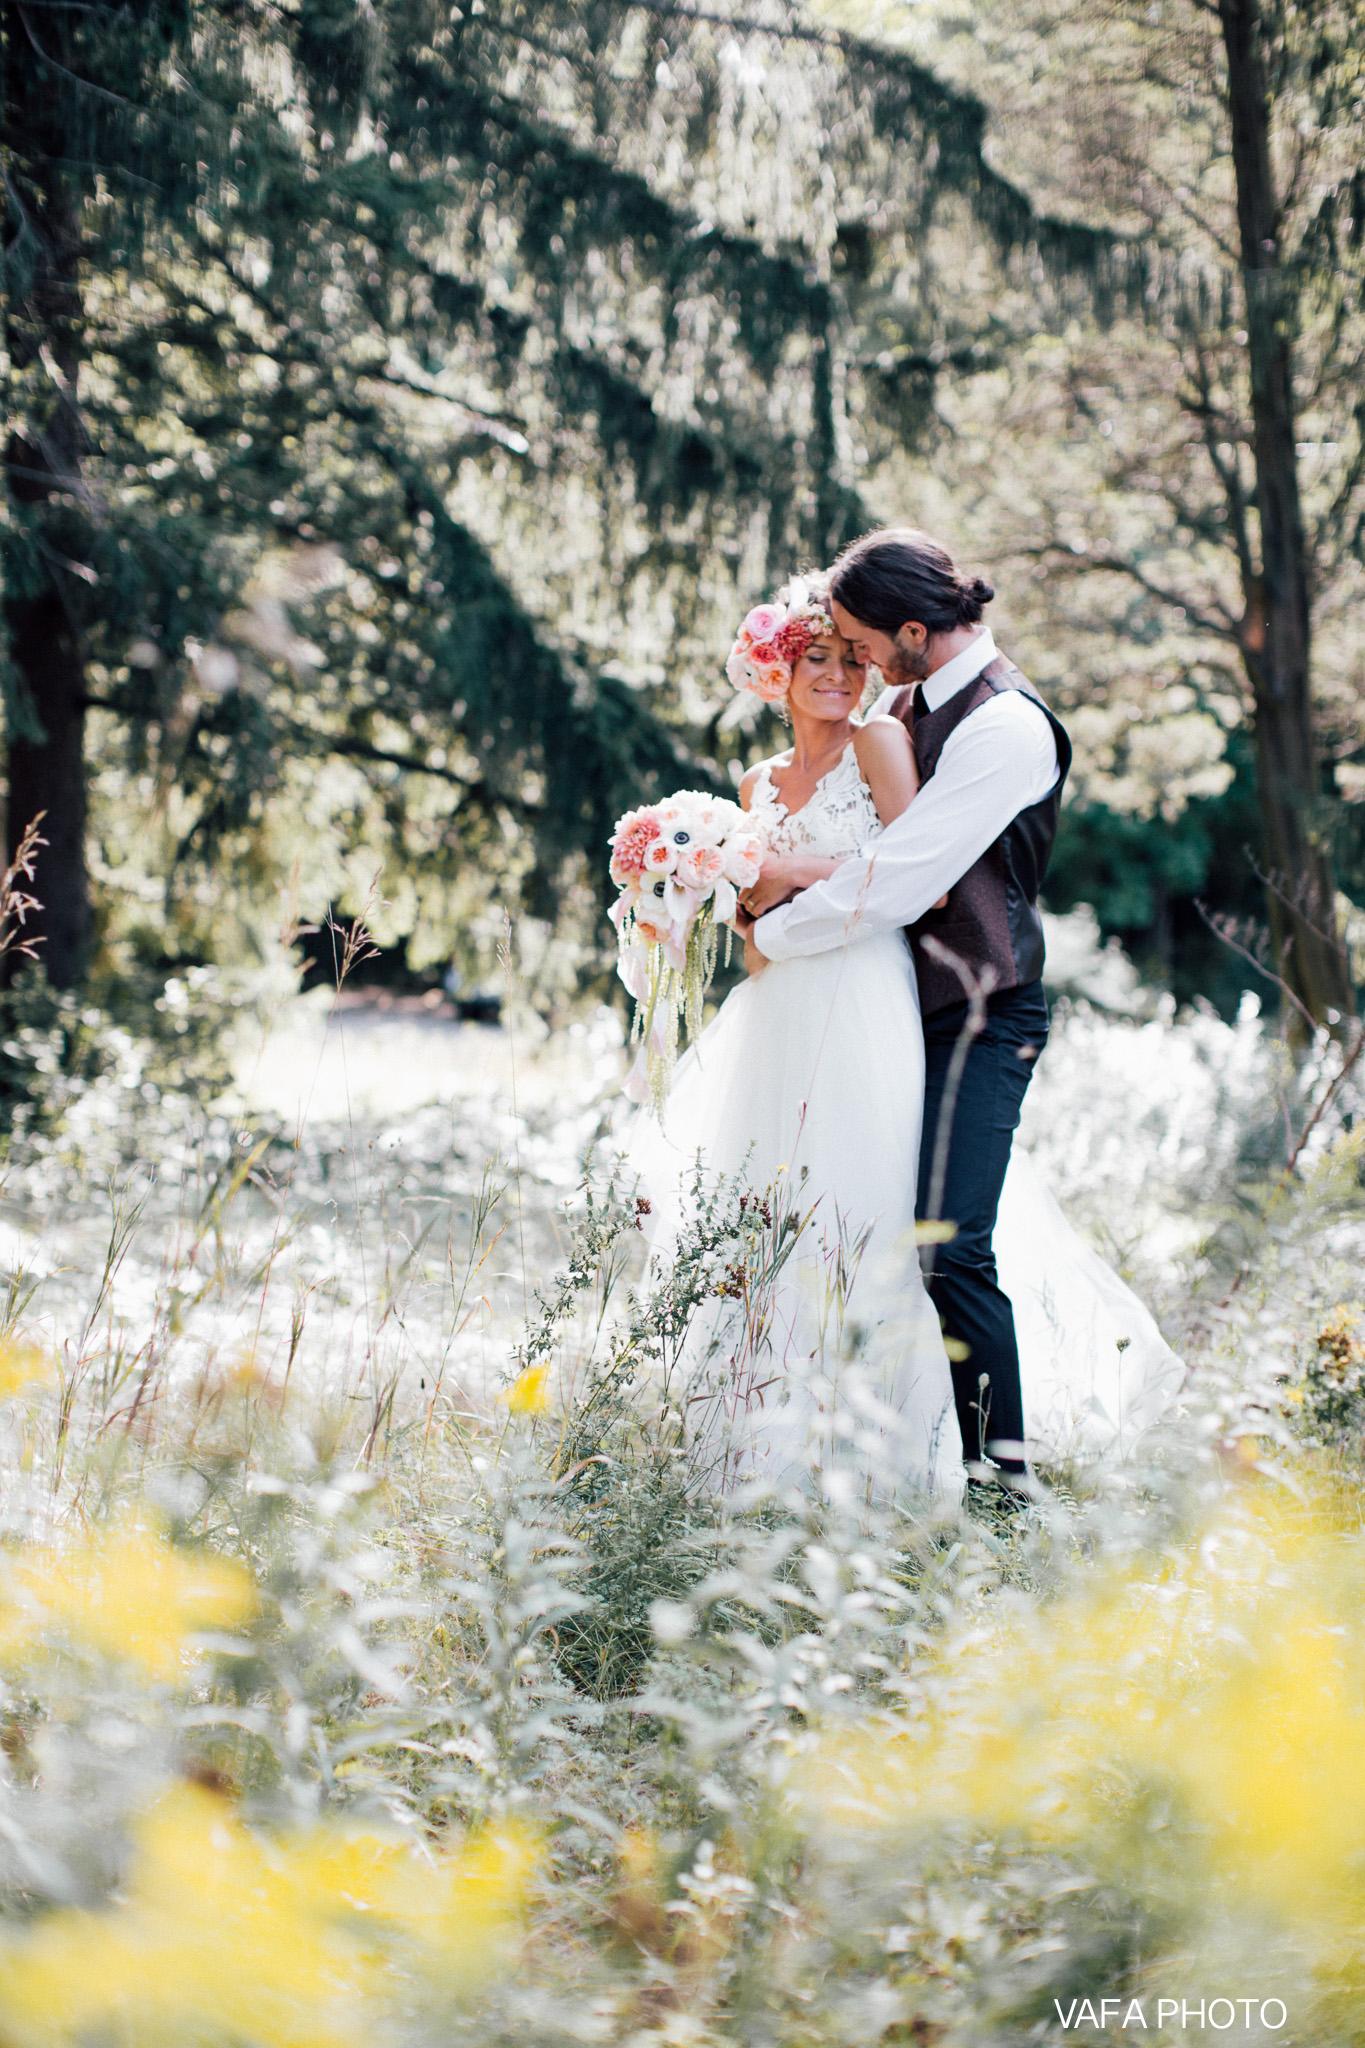 The-Felt-Estate-Wedding-Kailie-David-Vafa-Photo-755.jpg